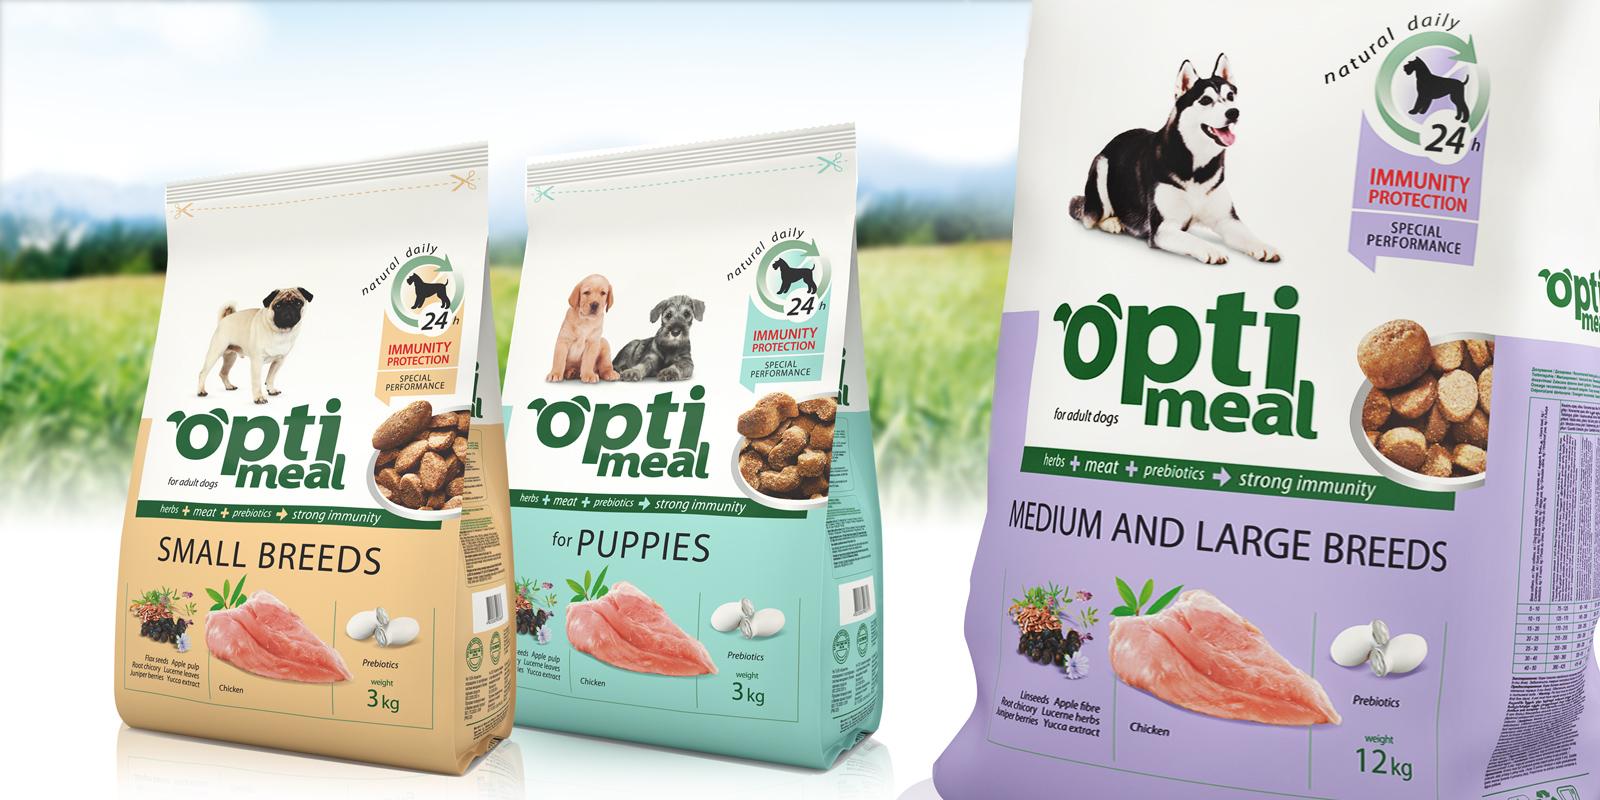 "ТМ Optimeal;;;;;;Разработка дизайна упаковок корма для собак ТМ Optimeal;;;;;;<span>Клиент:</span> Компания ""Кормотех"";;;;;;;;;;;;Разработка дизайна упаковок корма для собак ТМ Optimeal;;;;;;2"